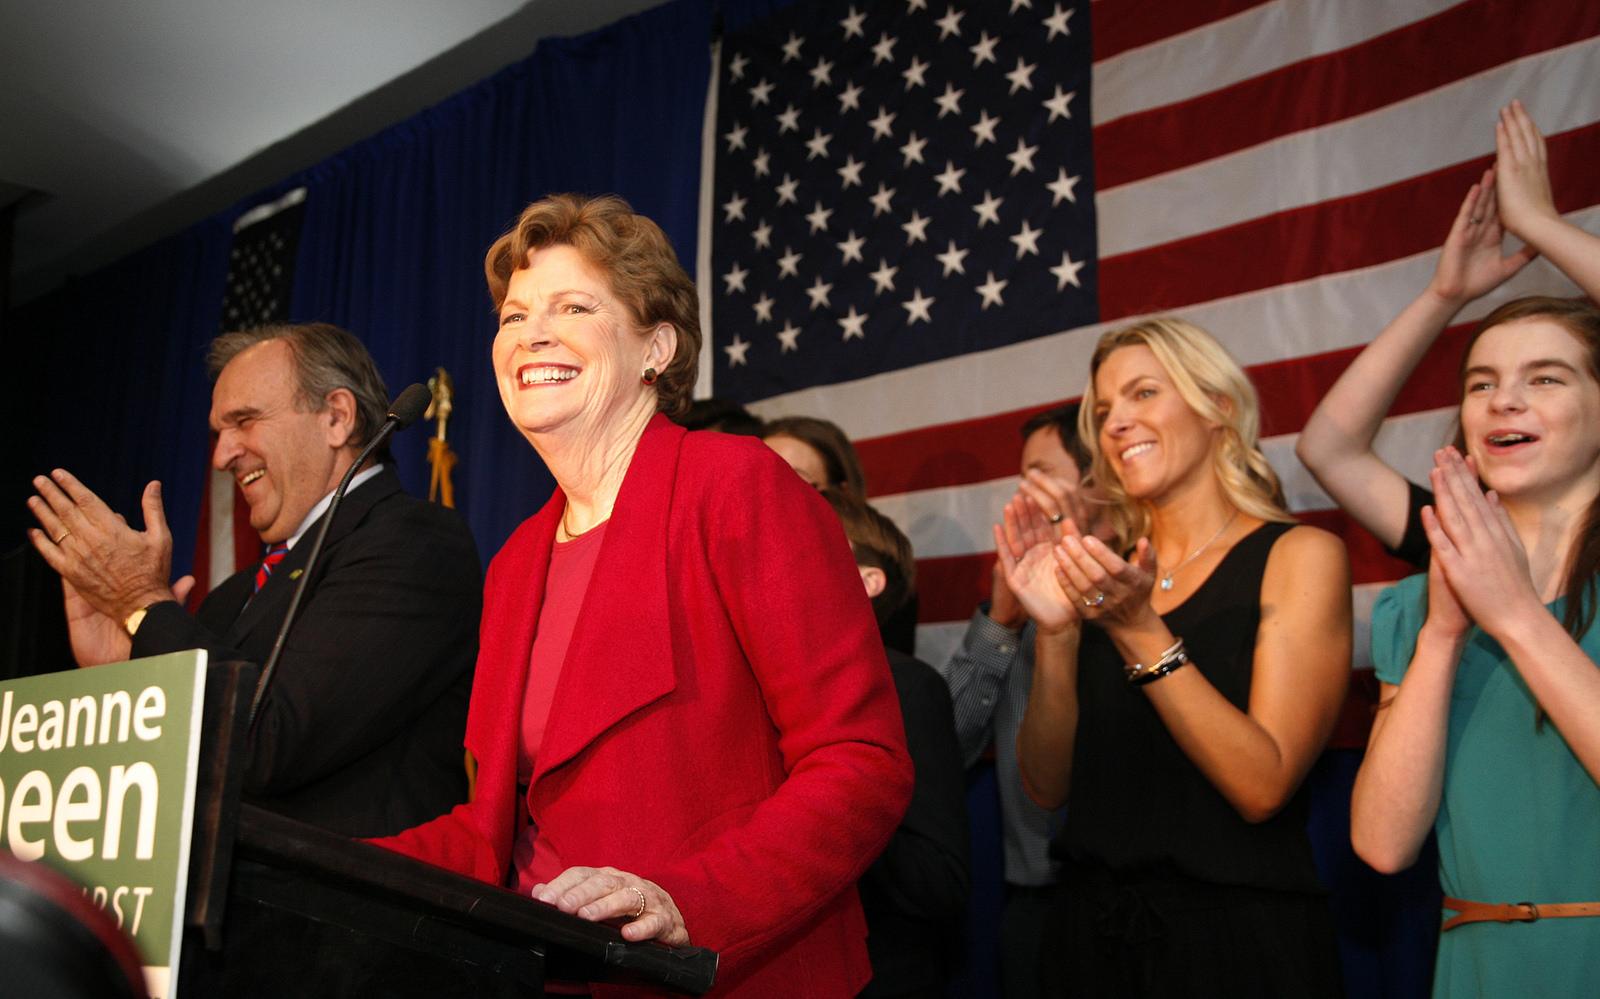 Sen. Jeanne Shaheen on election night, 2014